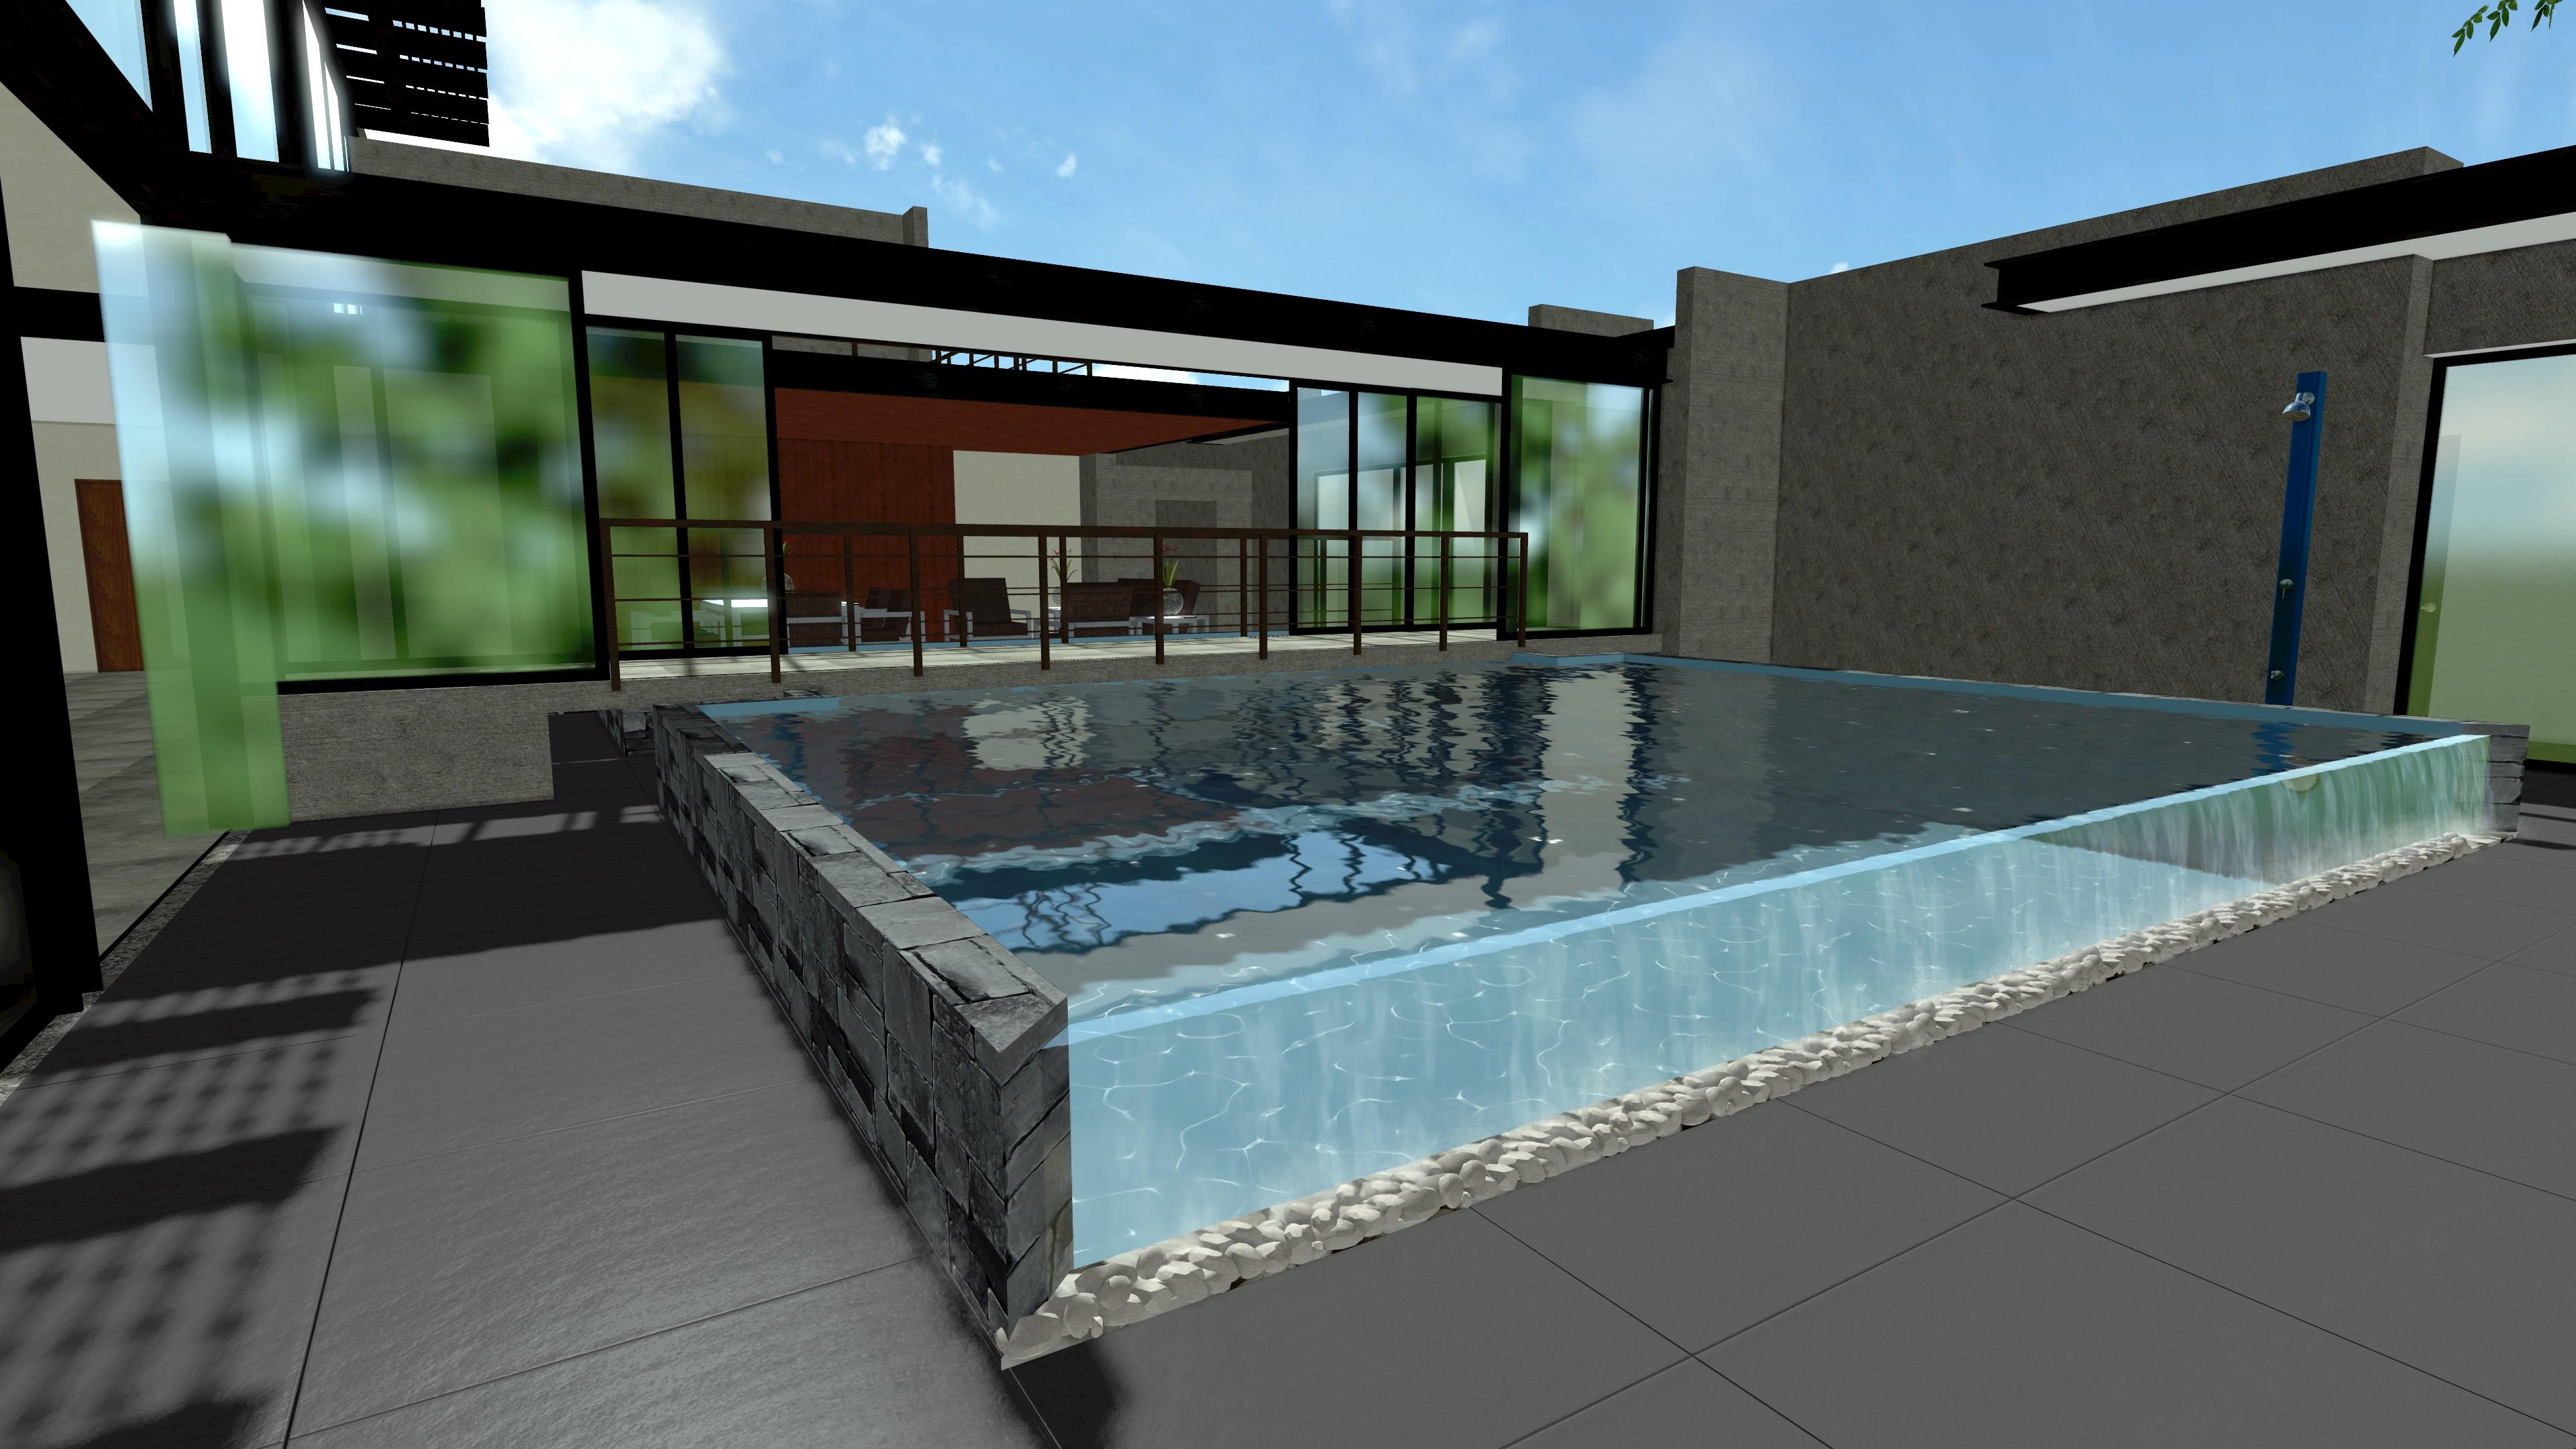 Immagini nbl pool designer - Piscina in vetro ...